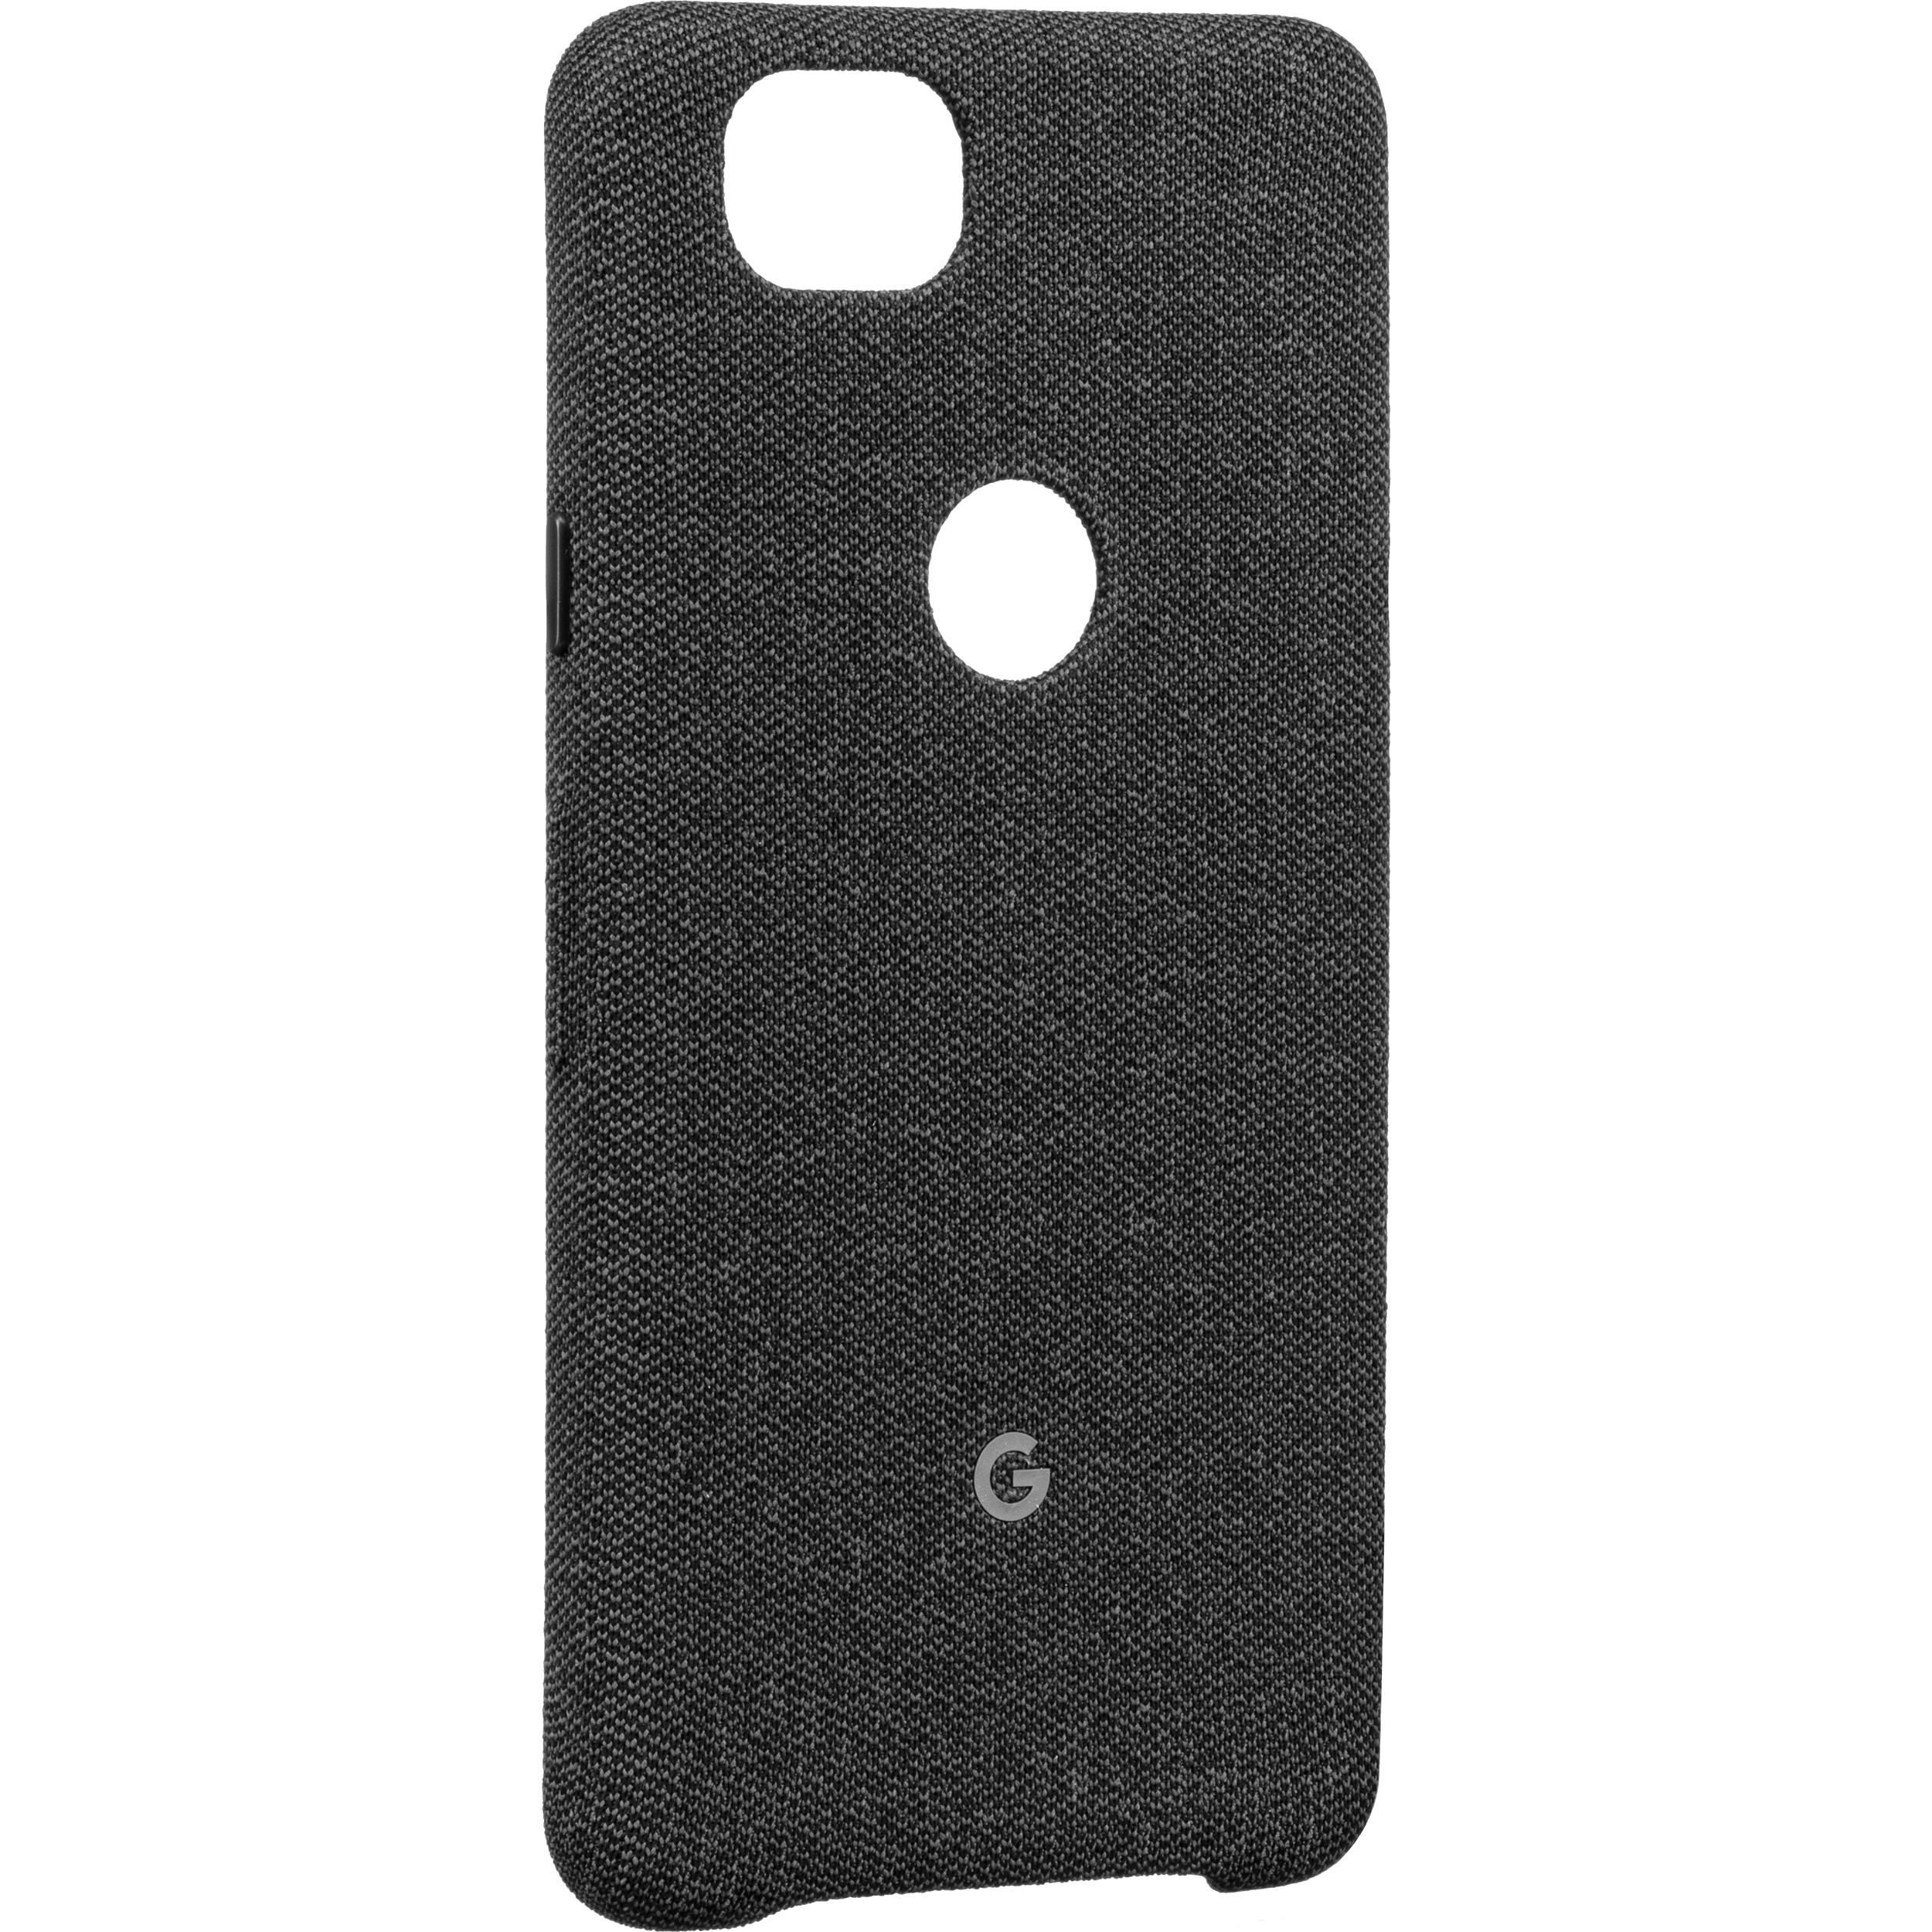 best service 153ec f51b6 Google Pixel 2 Fabric Case (Carbon) GA00159 B&H Photo Video